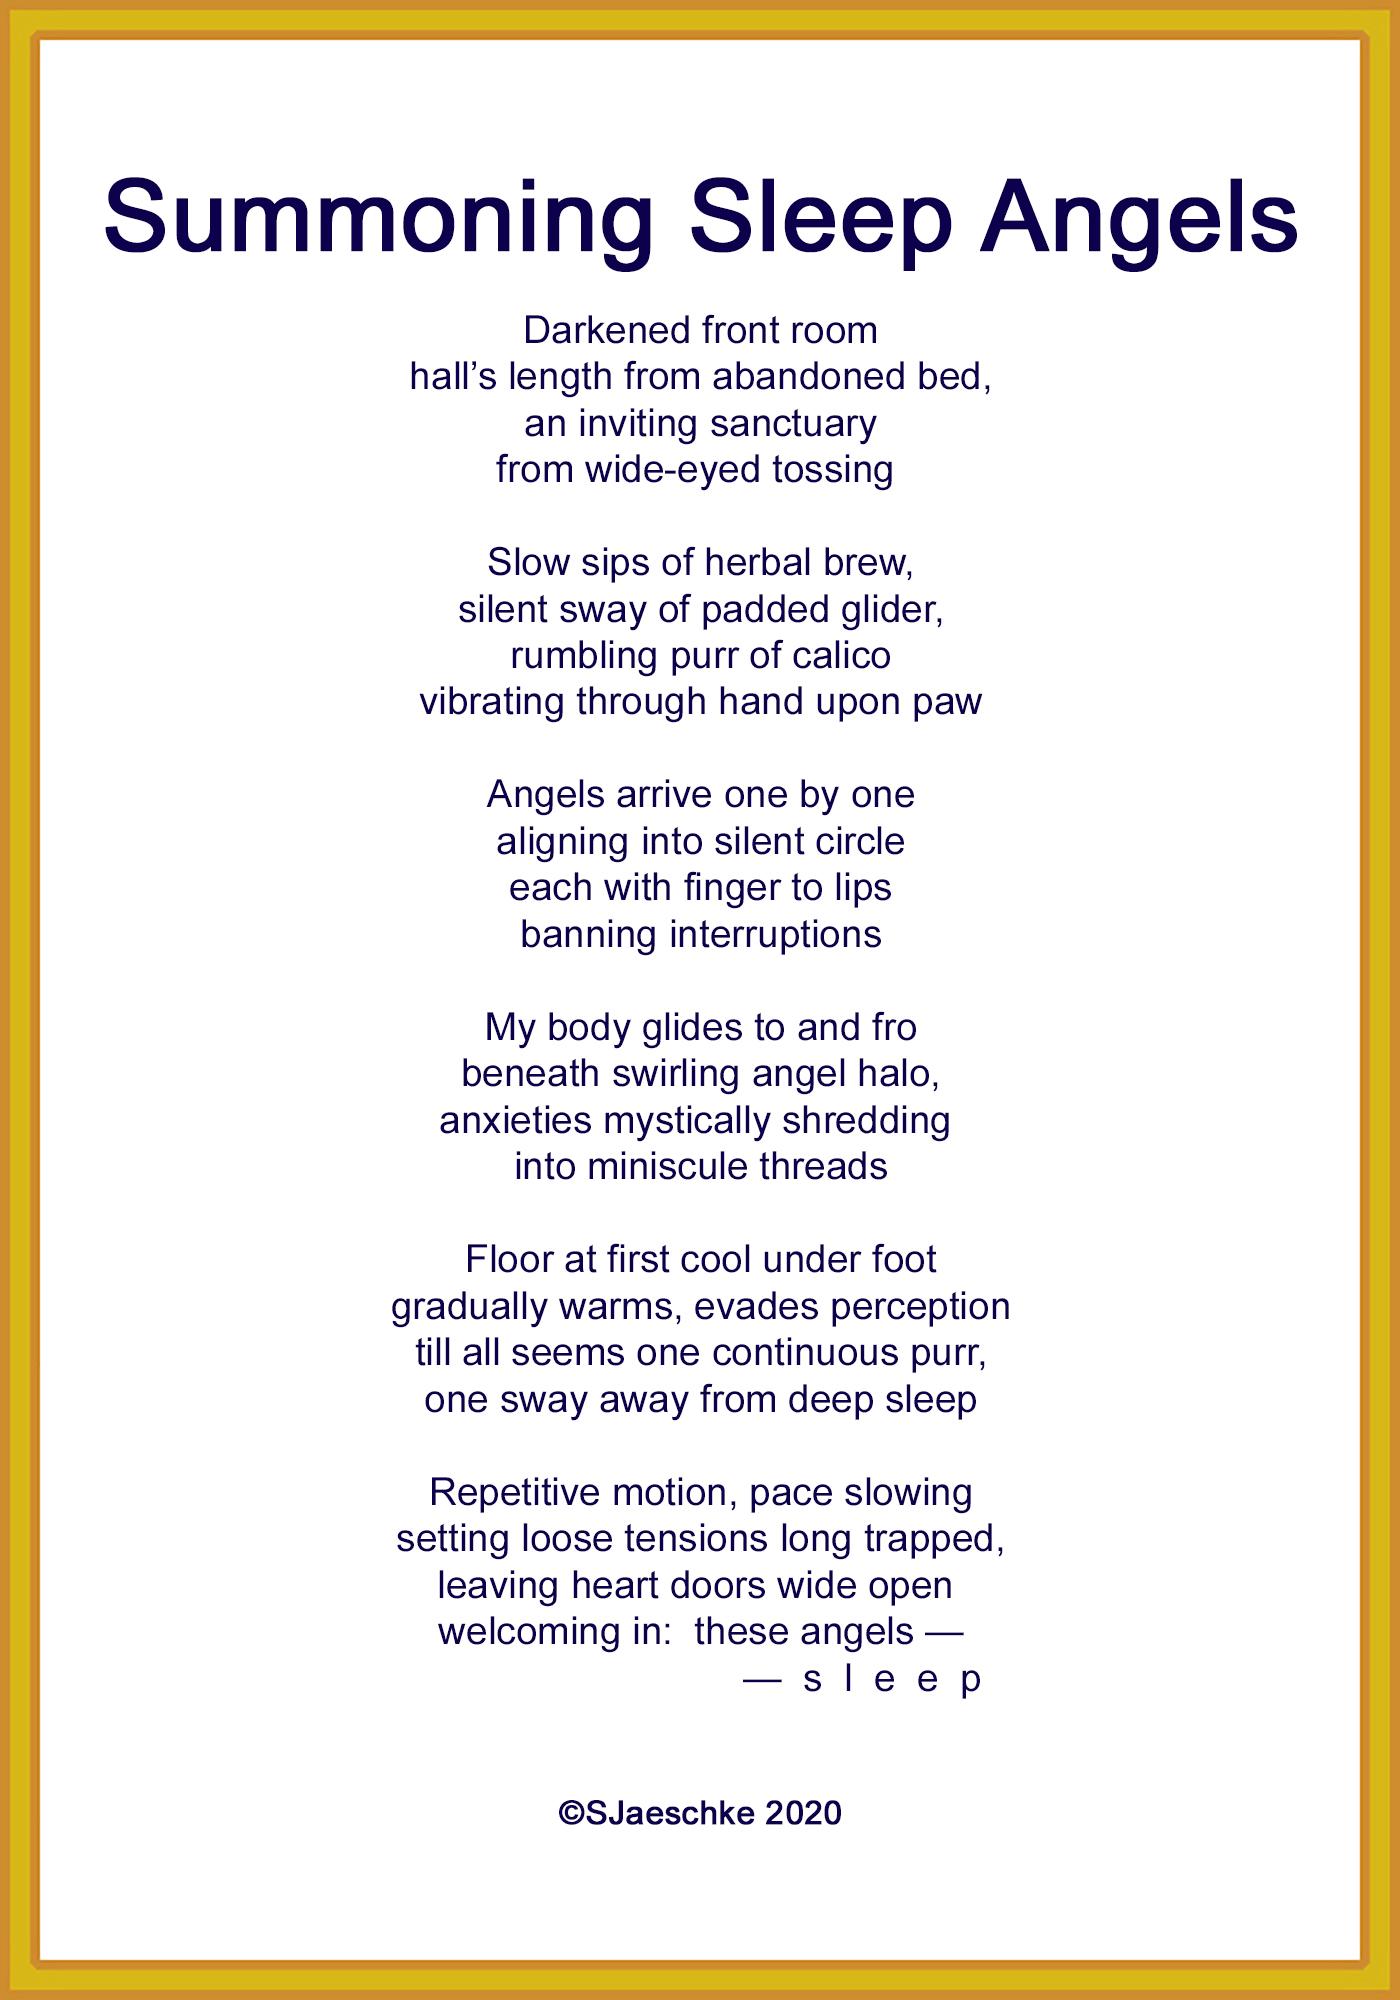 SoulCollage_2020-02-14_Poem_SummonSleepAngels